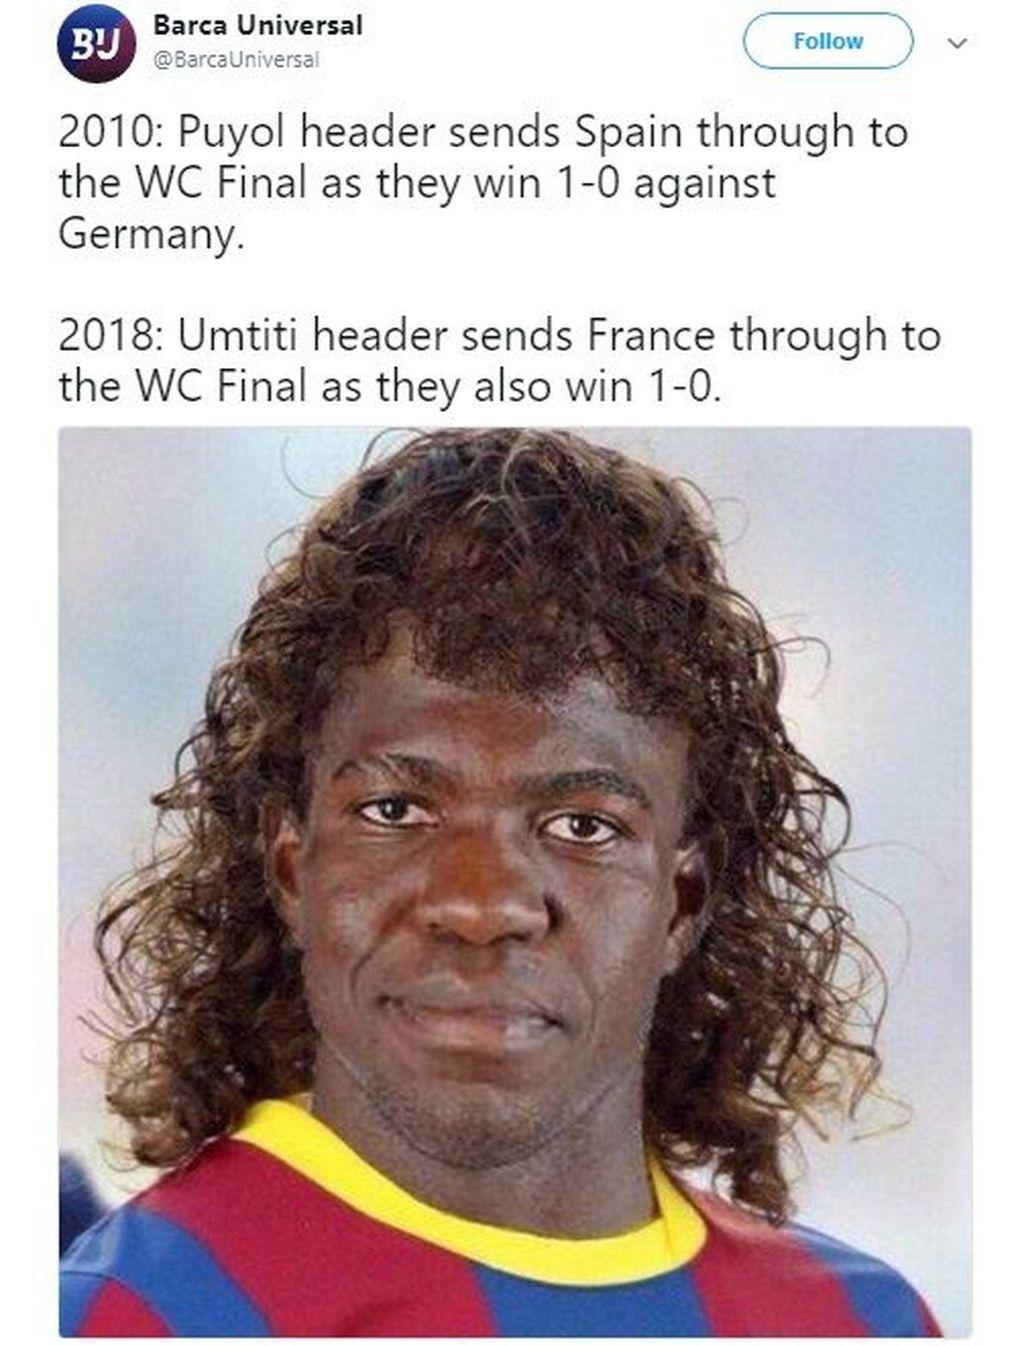 Kegemilangannya bahkan disamakan dengan Puyol yang mampu bawa Spanyol ke Piala Dunia 2010. Foto: Istimewa